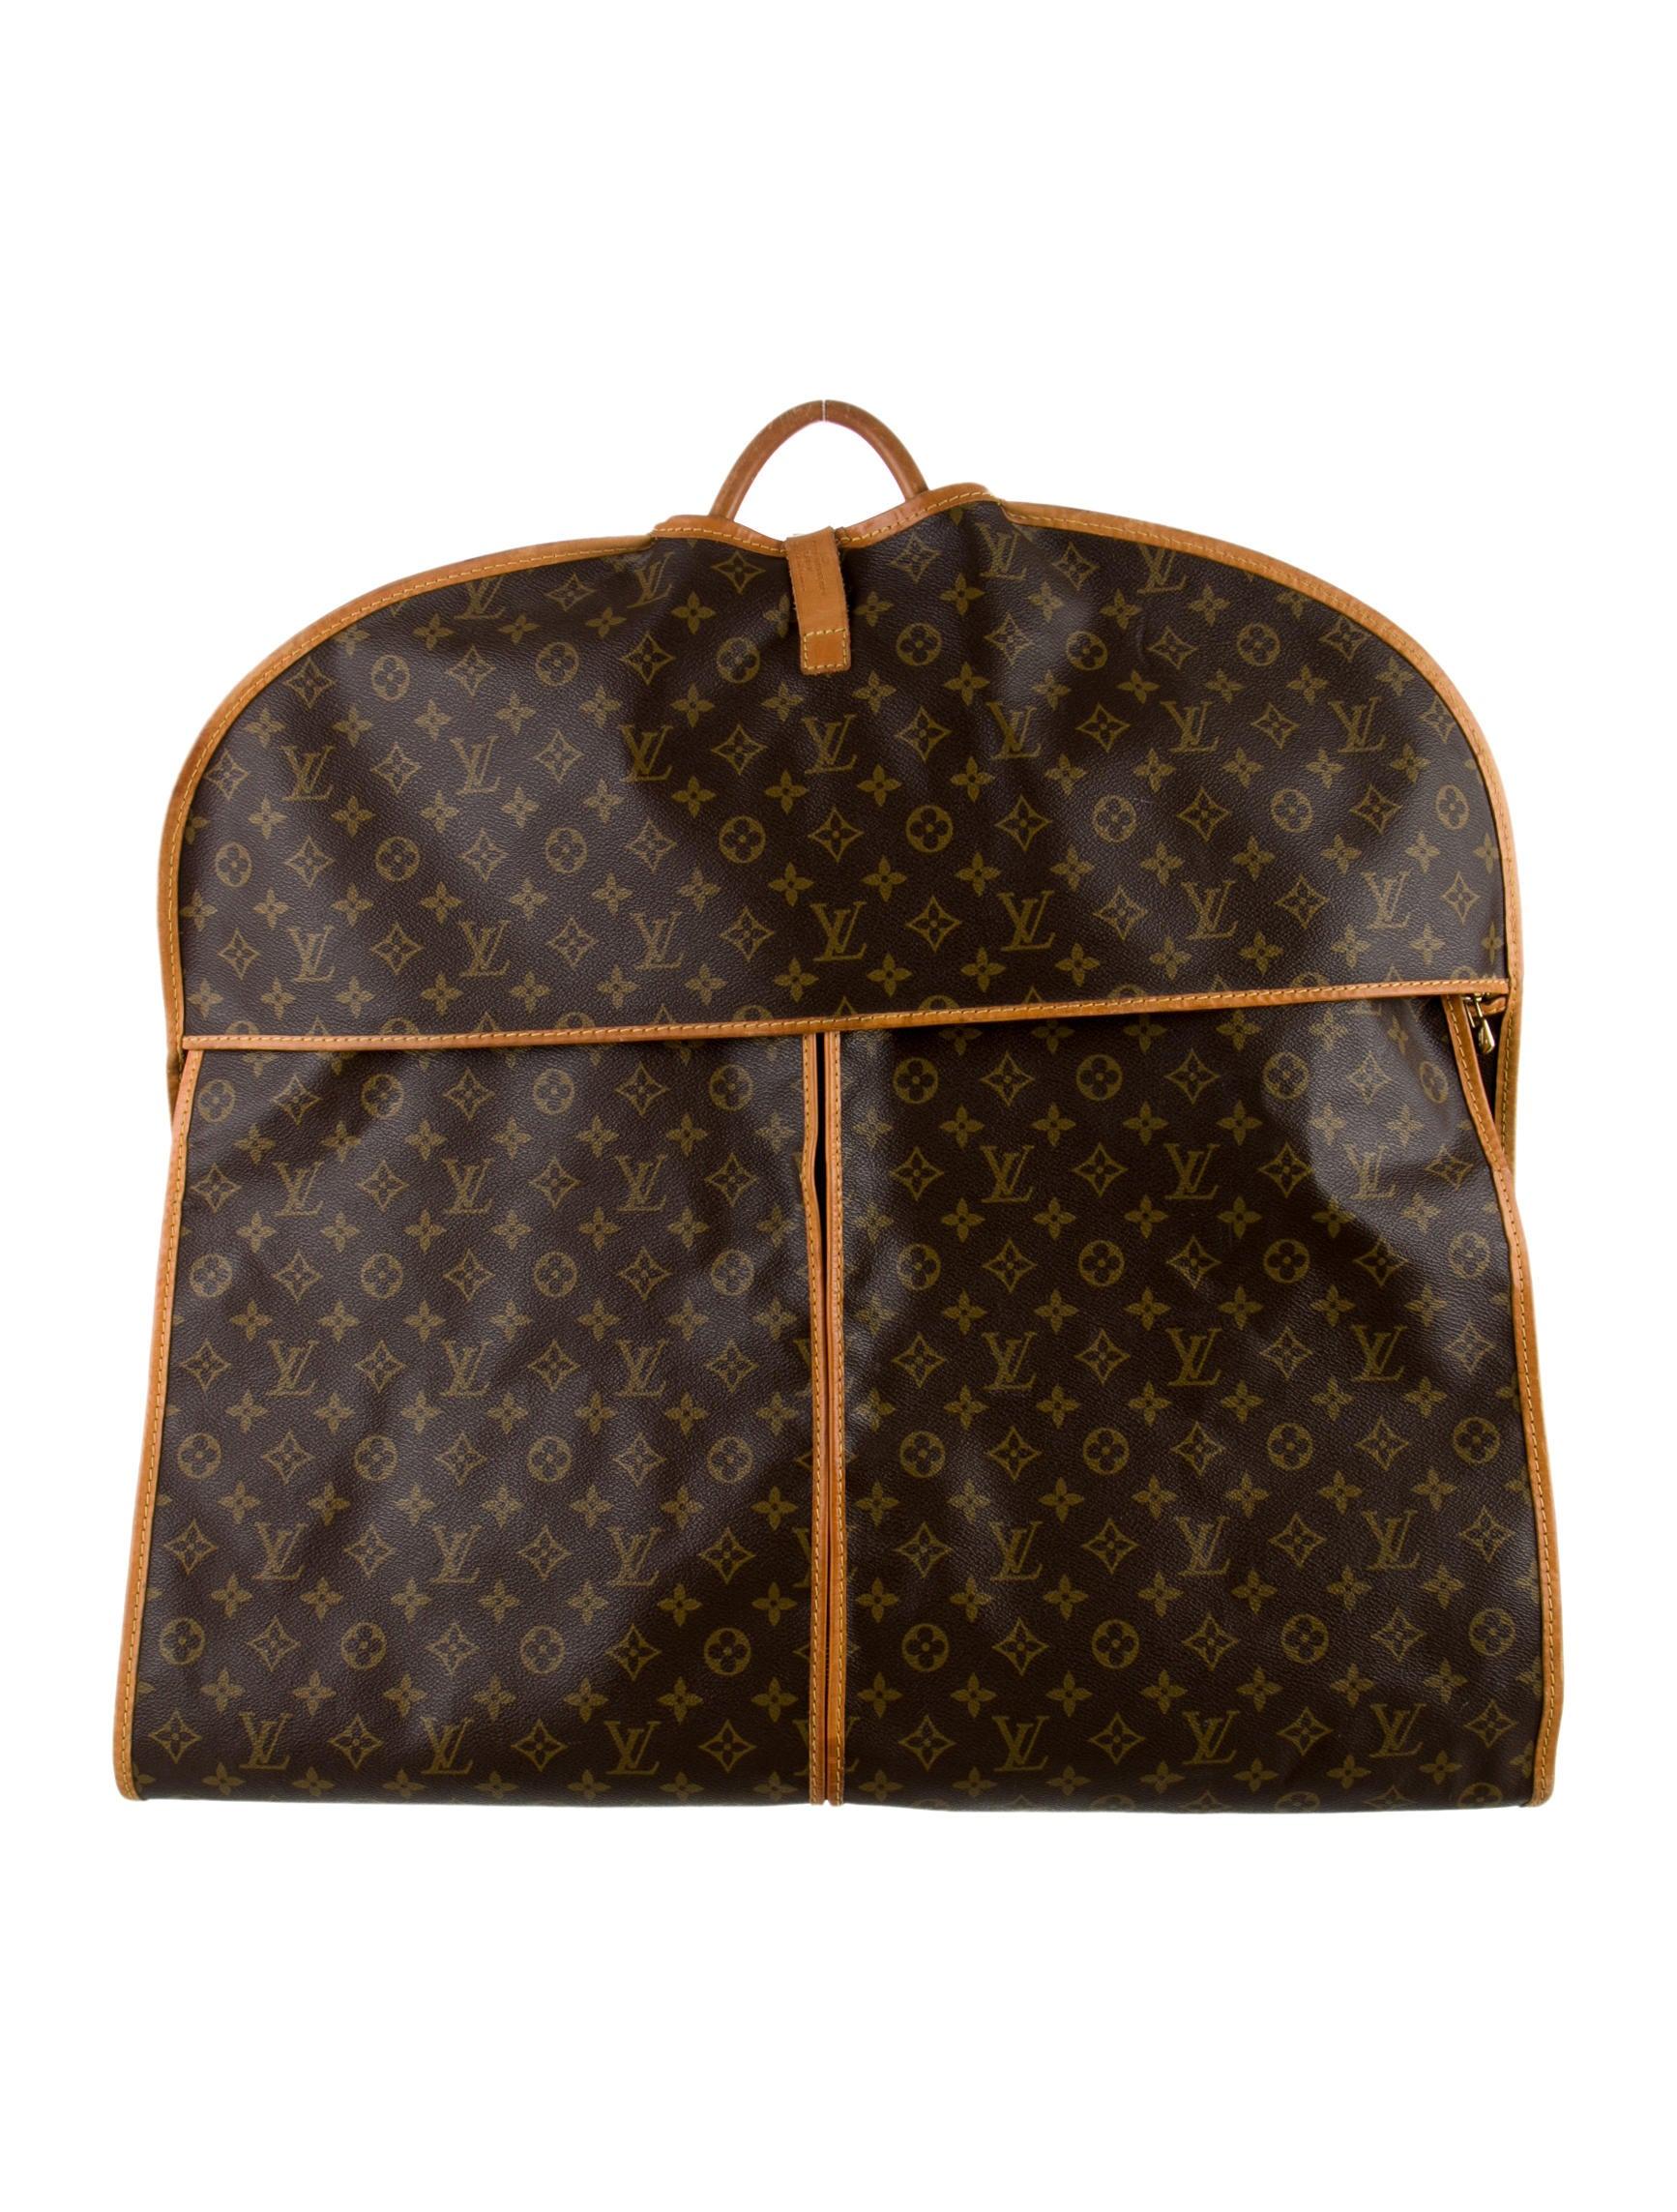 louis vuitton vintage monogram garment cover bags lou64866 the realreal. Black Bedroom Furniture Sets. Home Design Ideas